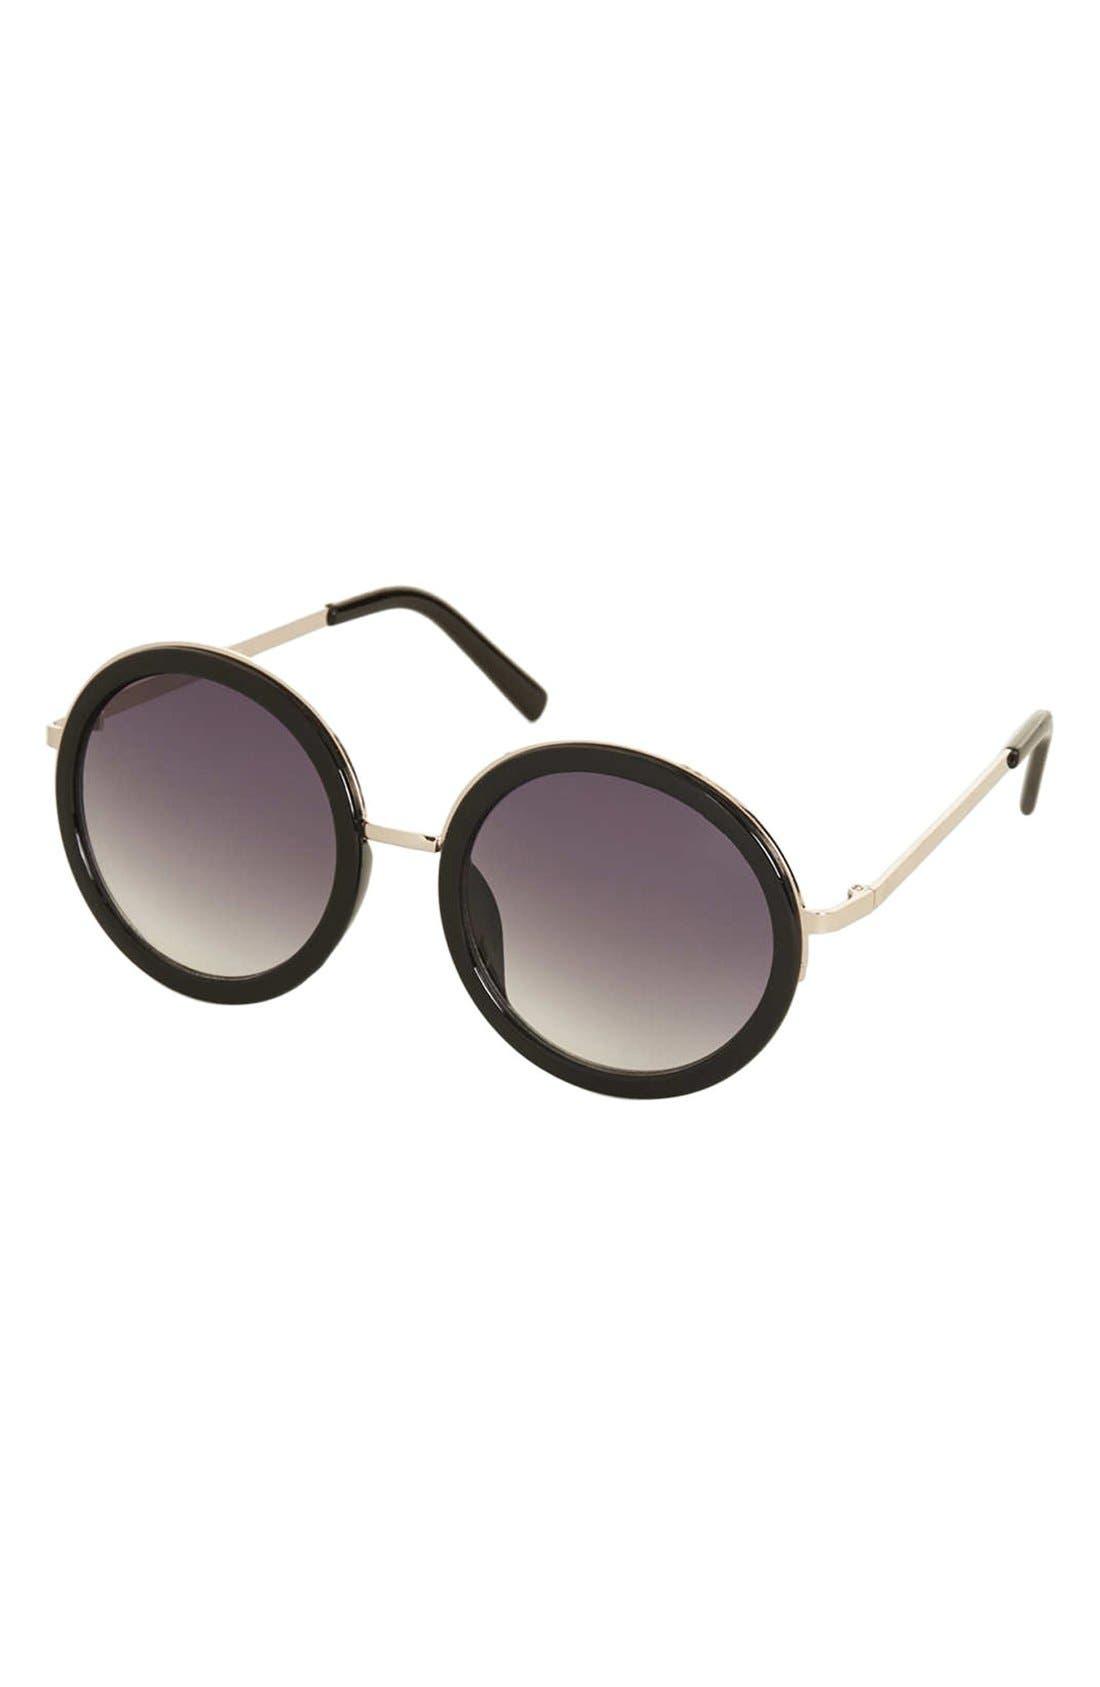 Main Image - Topshop 'Lolita' 50mm Round Sunglasses